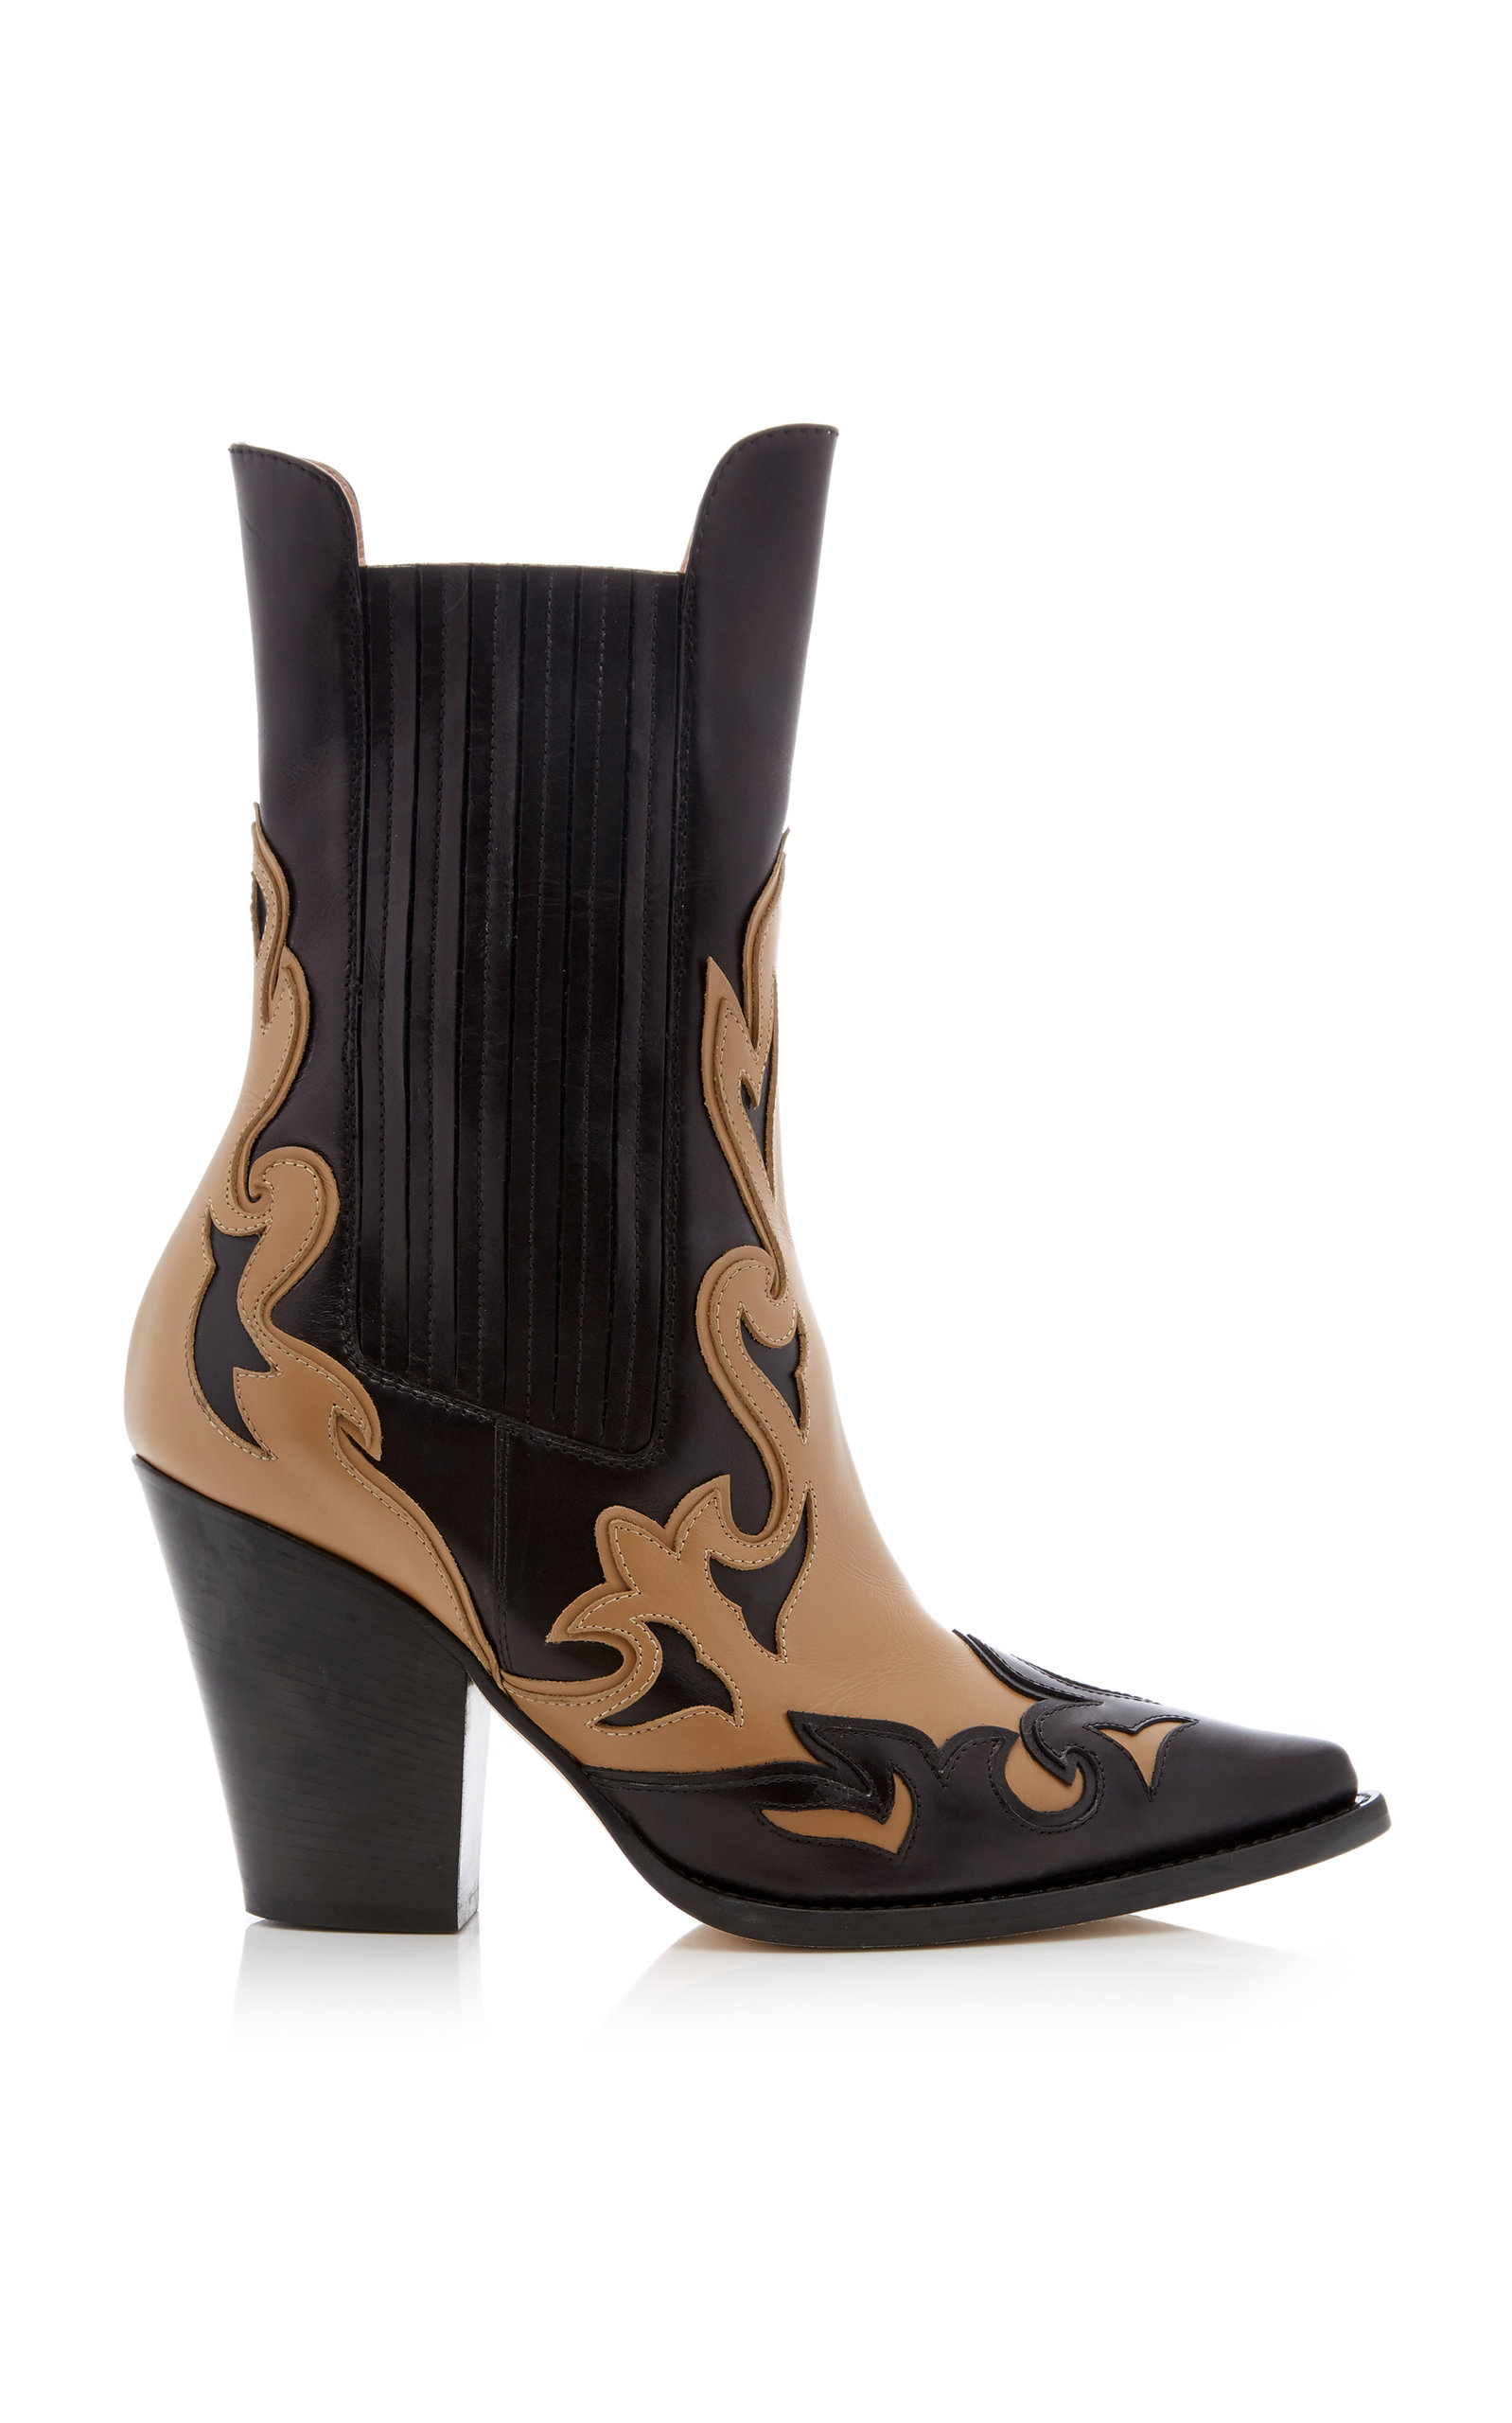 Two Tone Cowboy Boots, Black